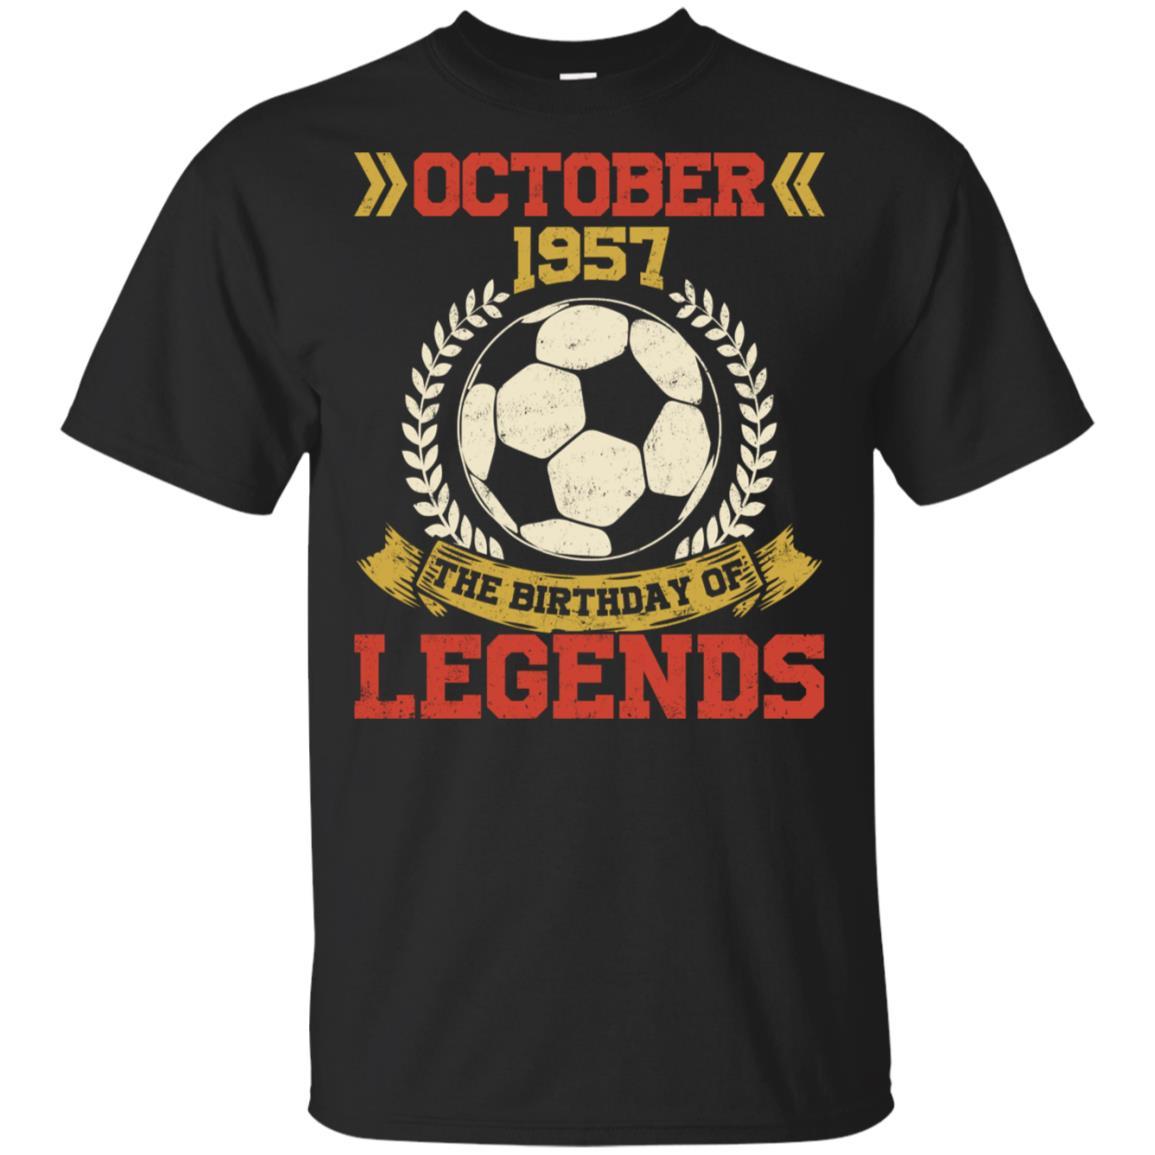 1957 October 61st Birthday Of Football Soccer Legend Unisex Short Sleeve